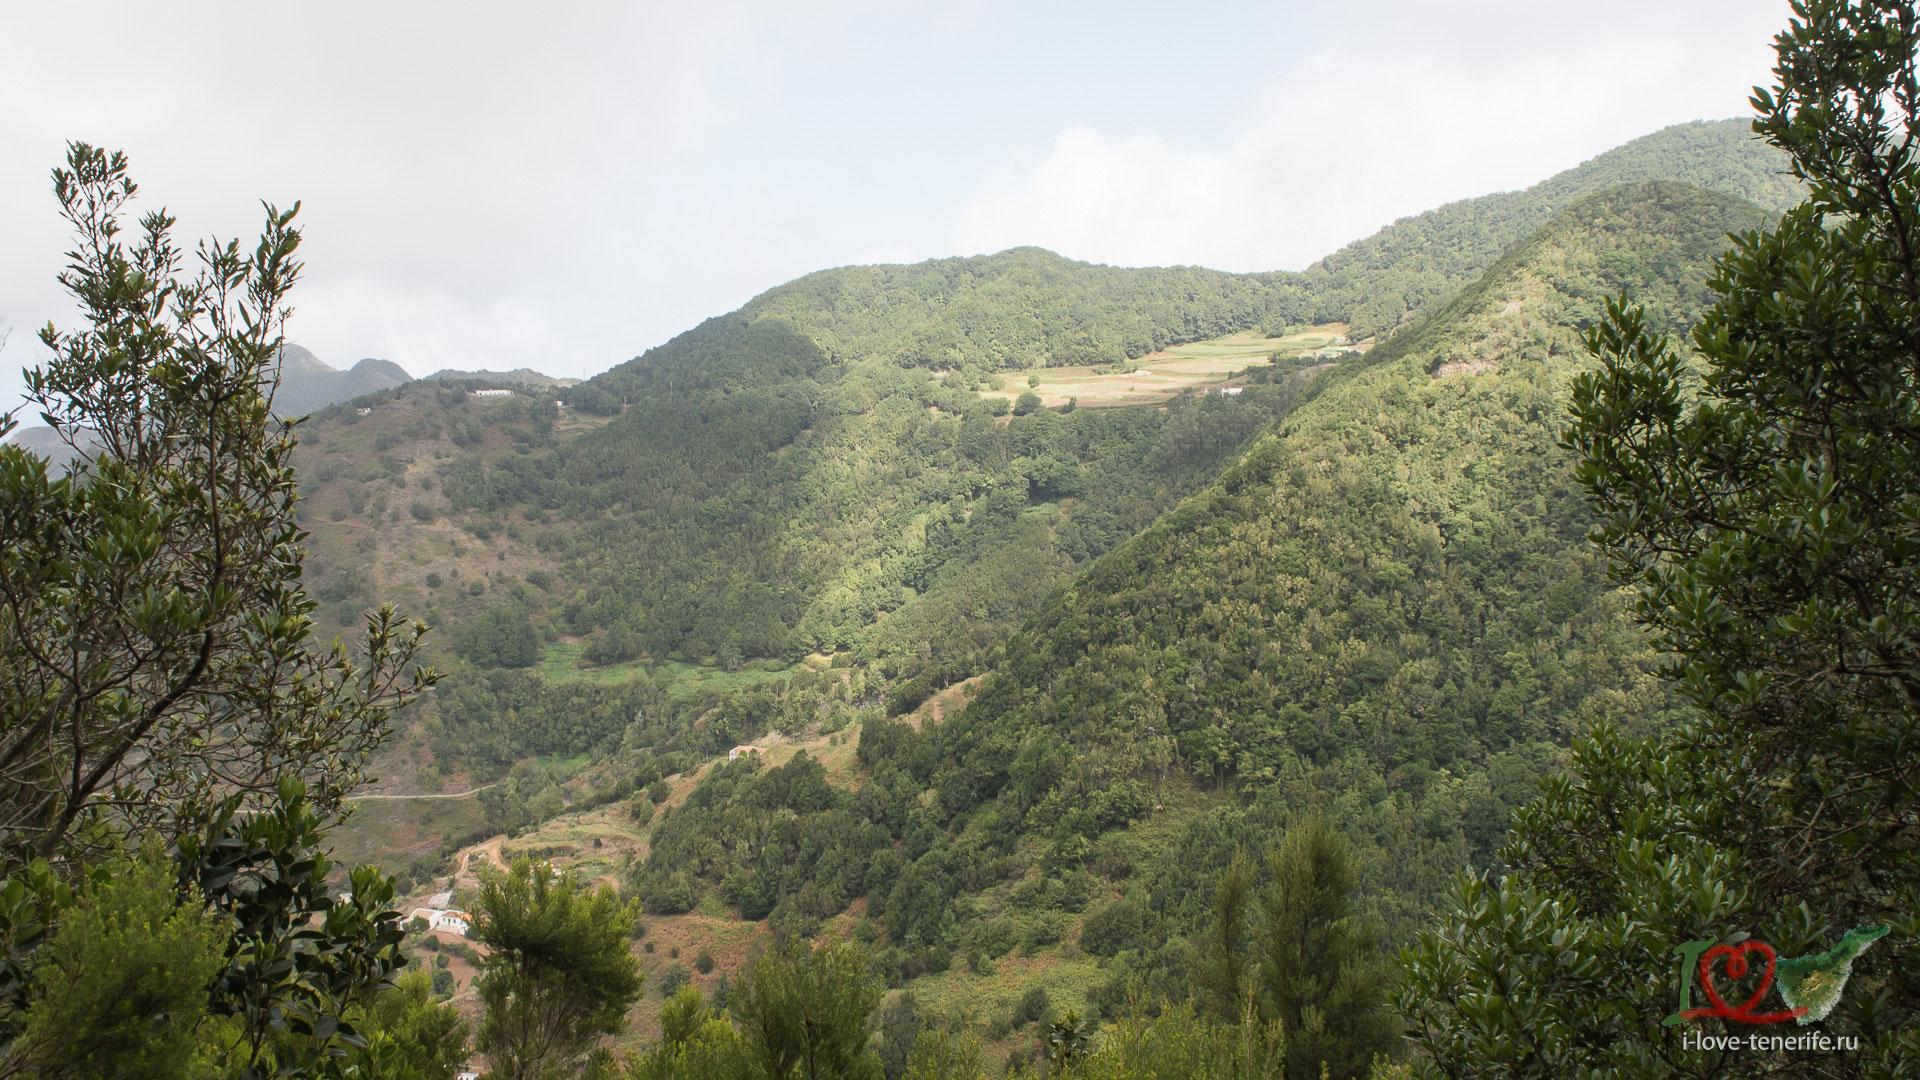 Пеший маршрут в Cruz de Carmen, Anaga, Tenerife